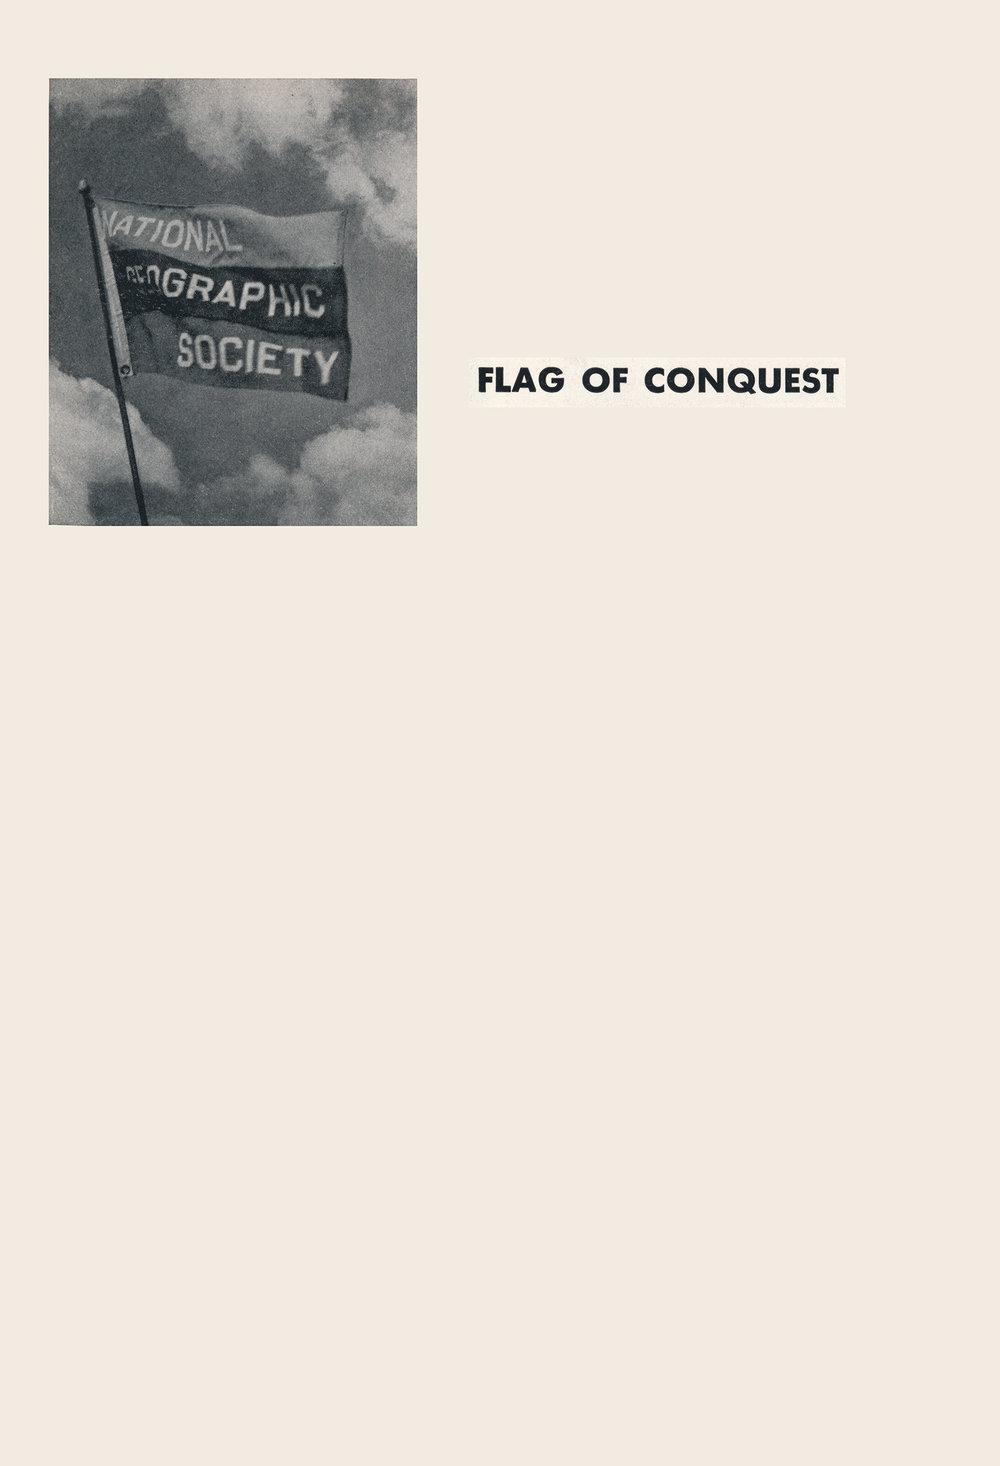 mdizon_flag_of_conquest.jpg